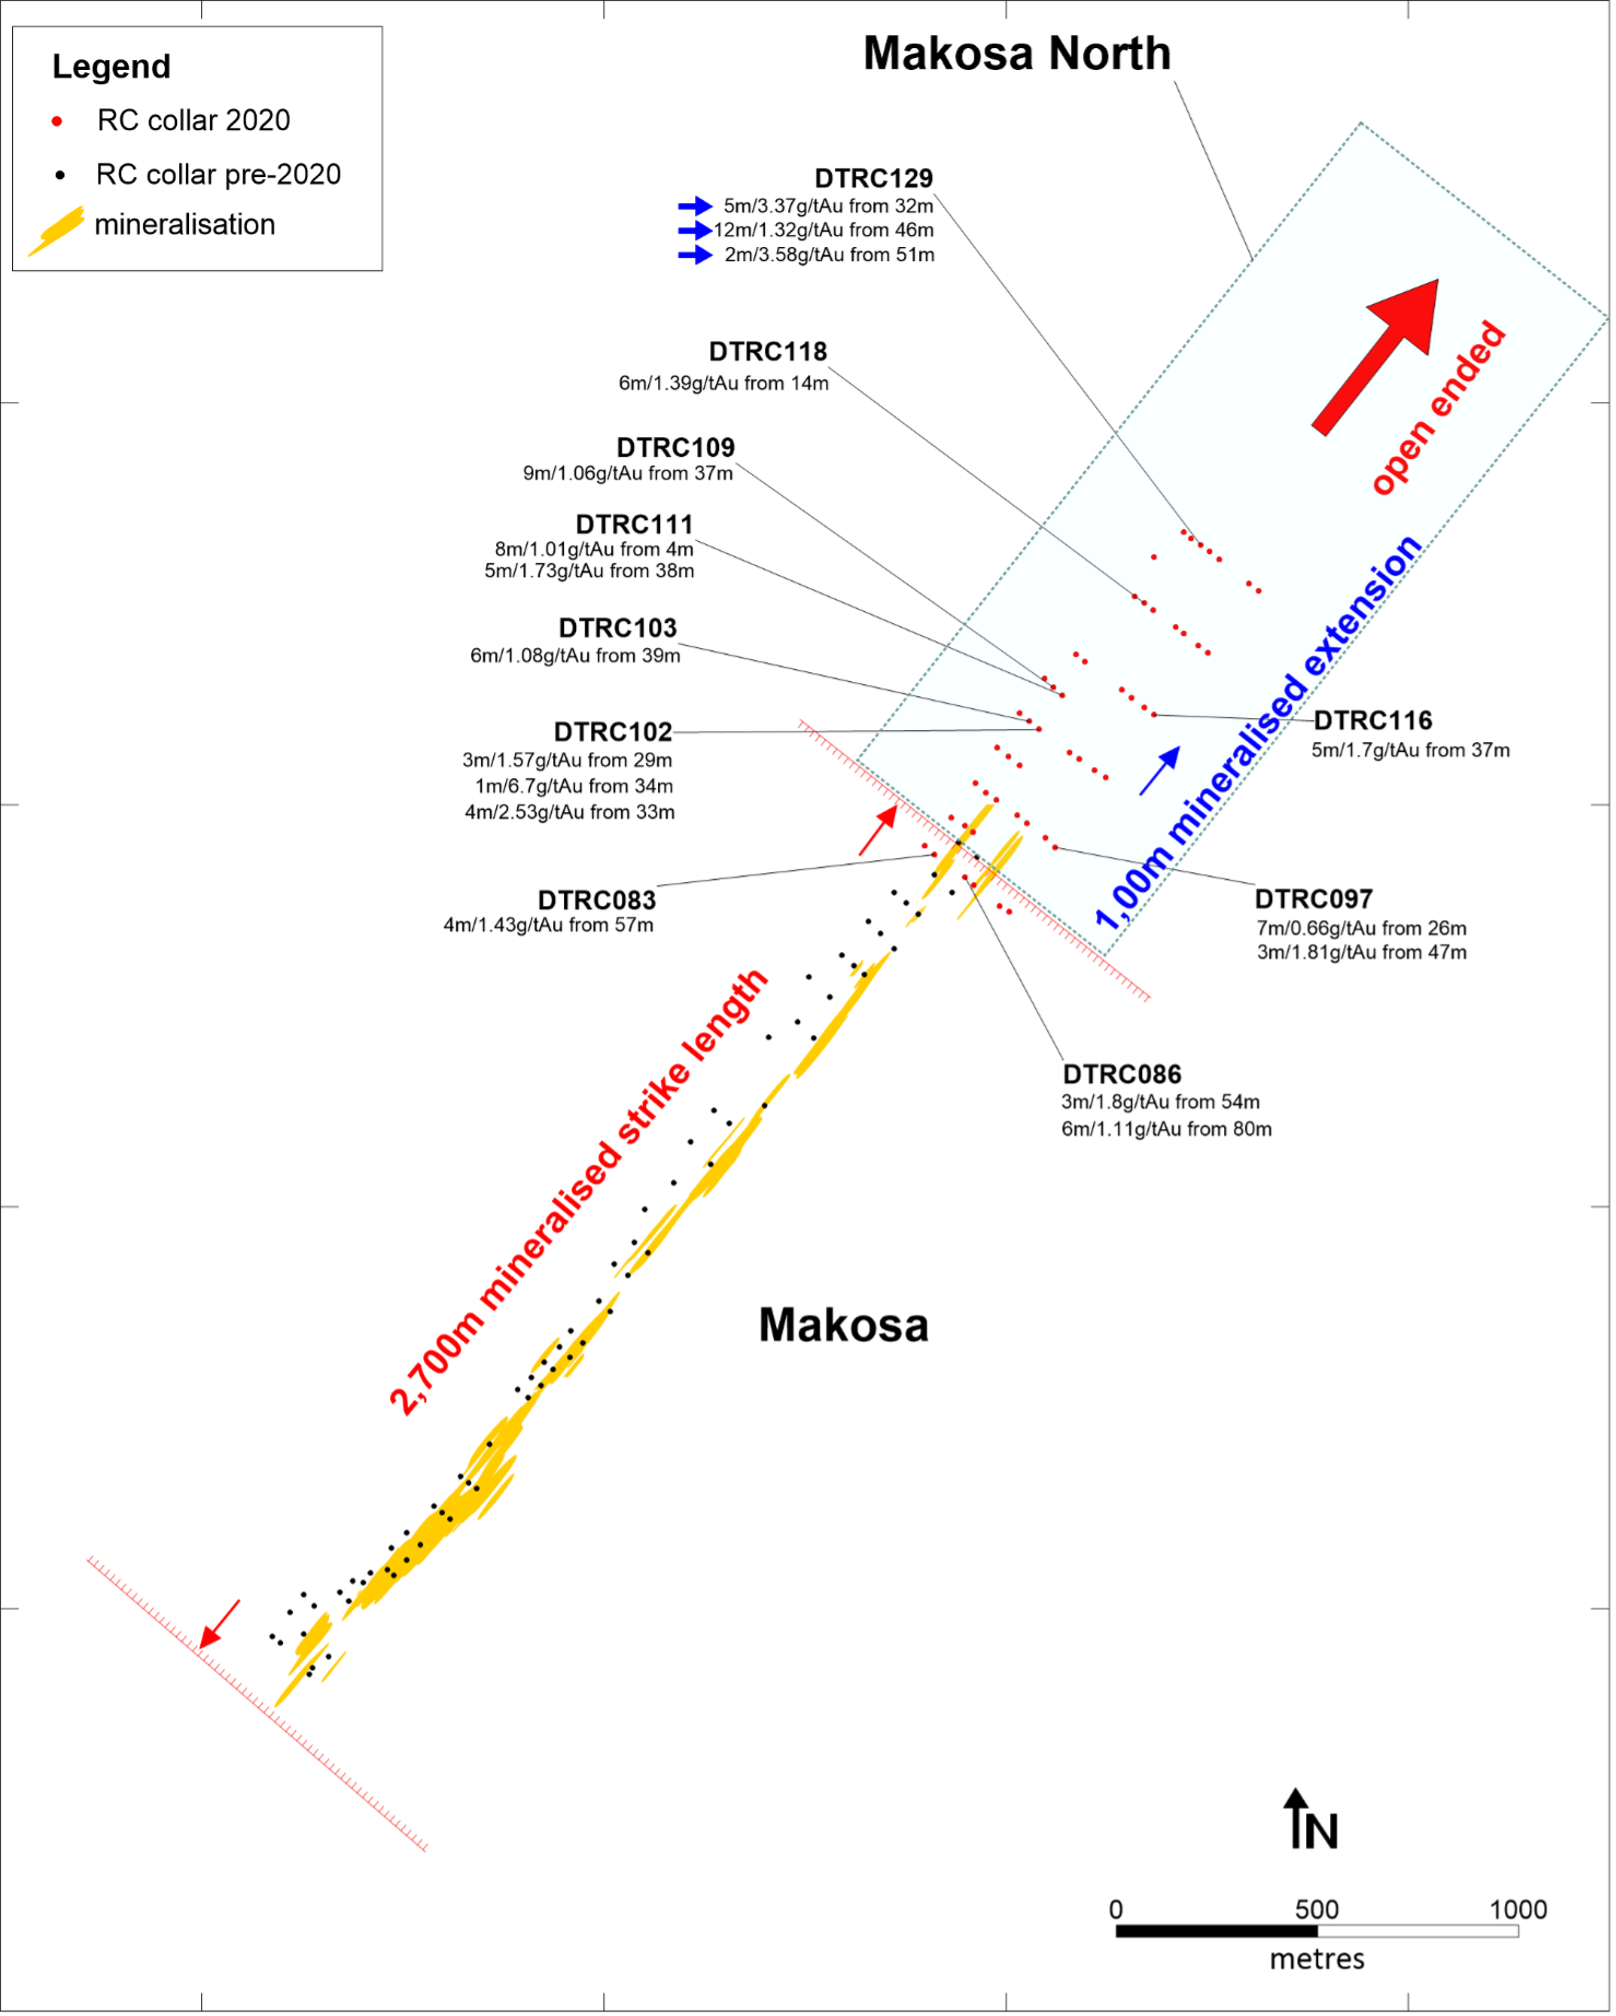 Figure 2- Makosa North drillhole location map